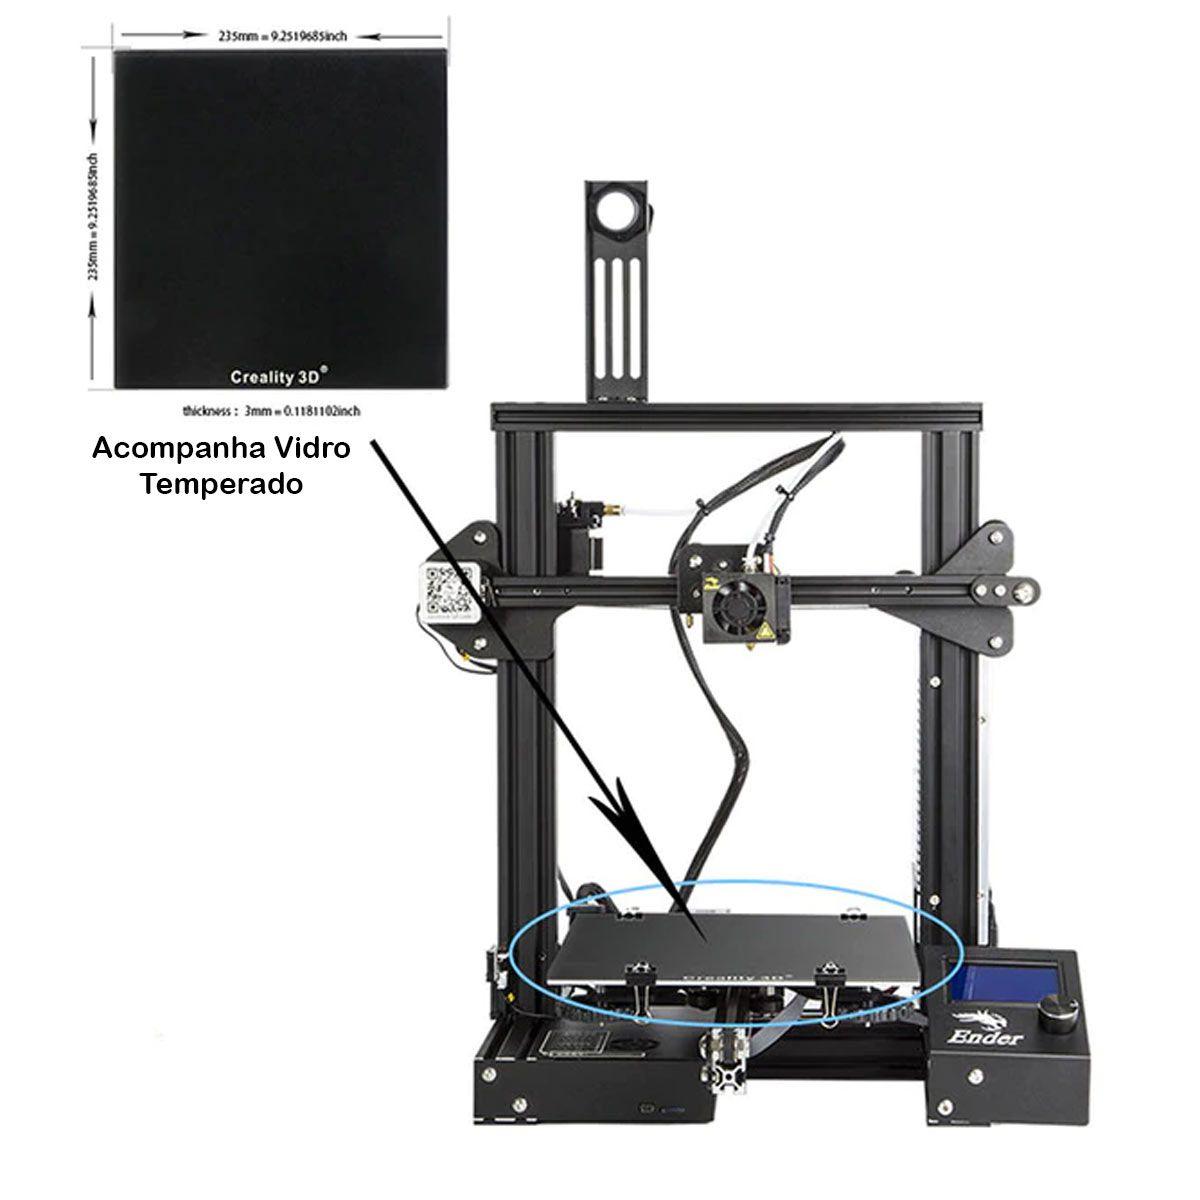 Impressora 3D Creality Ender 3 | Bivolt | 220 x 220 x 250mm